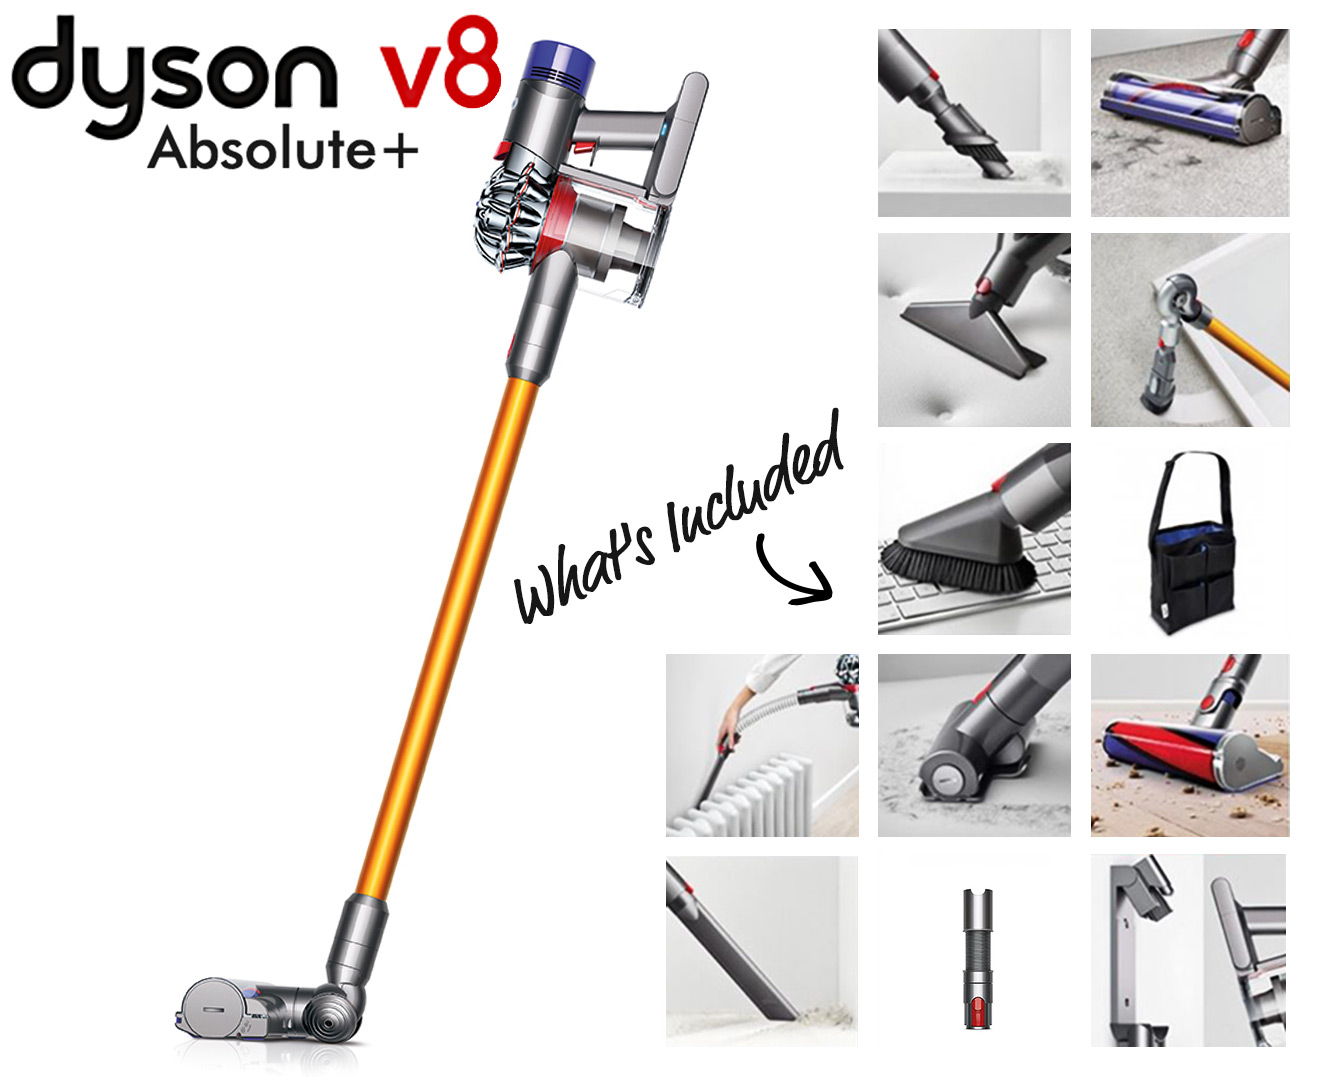 Dyson V8 Absolute Modell 2021